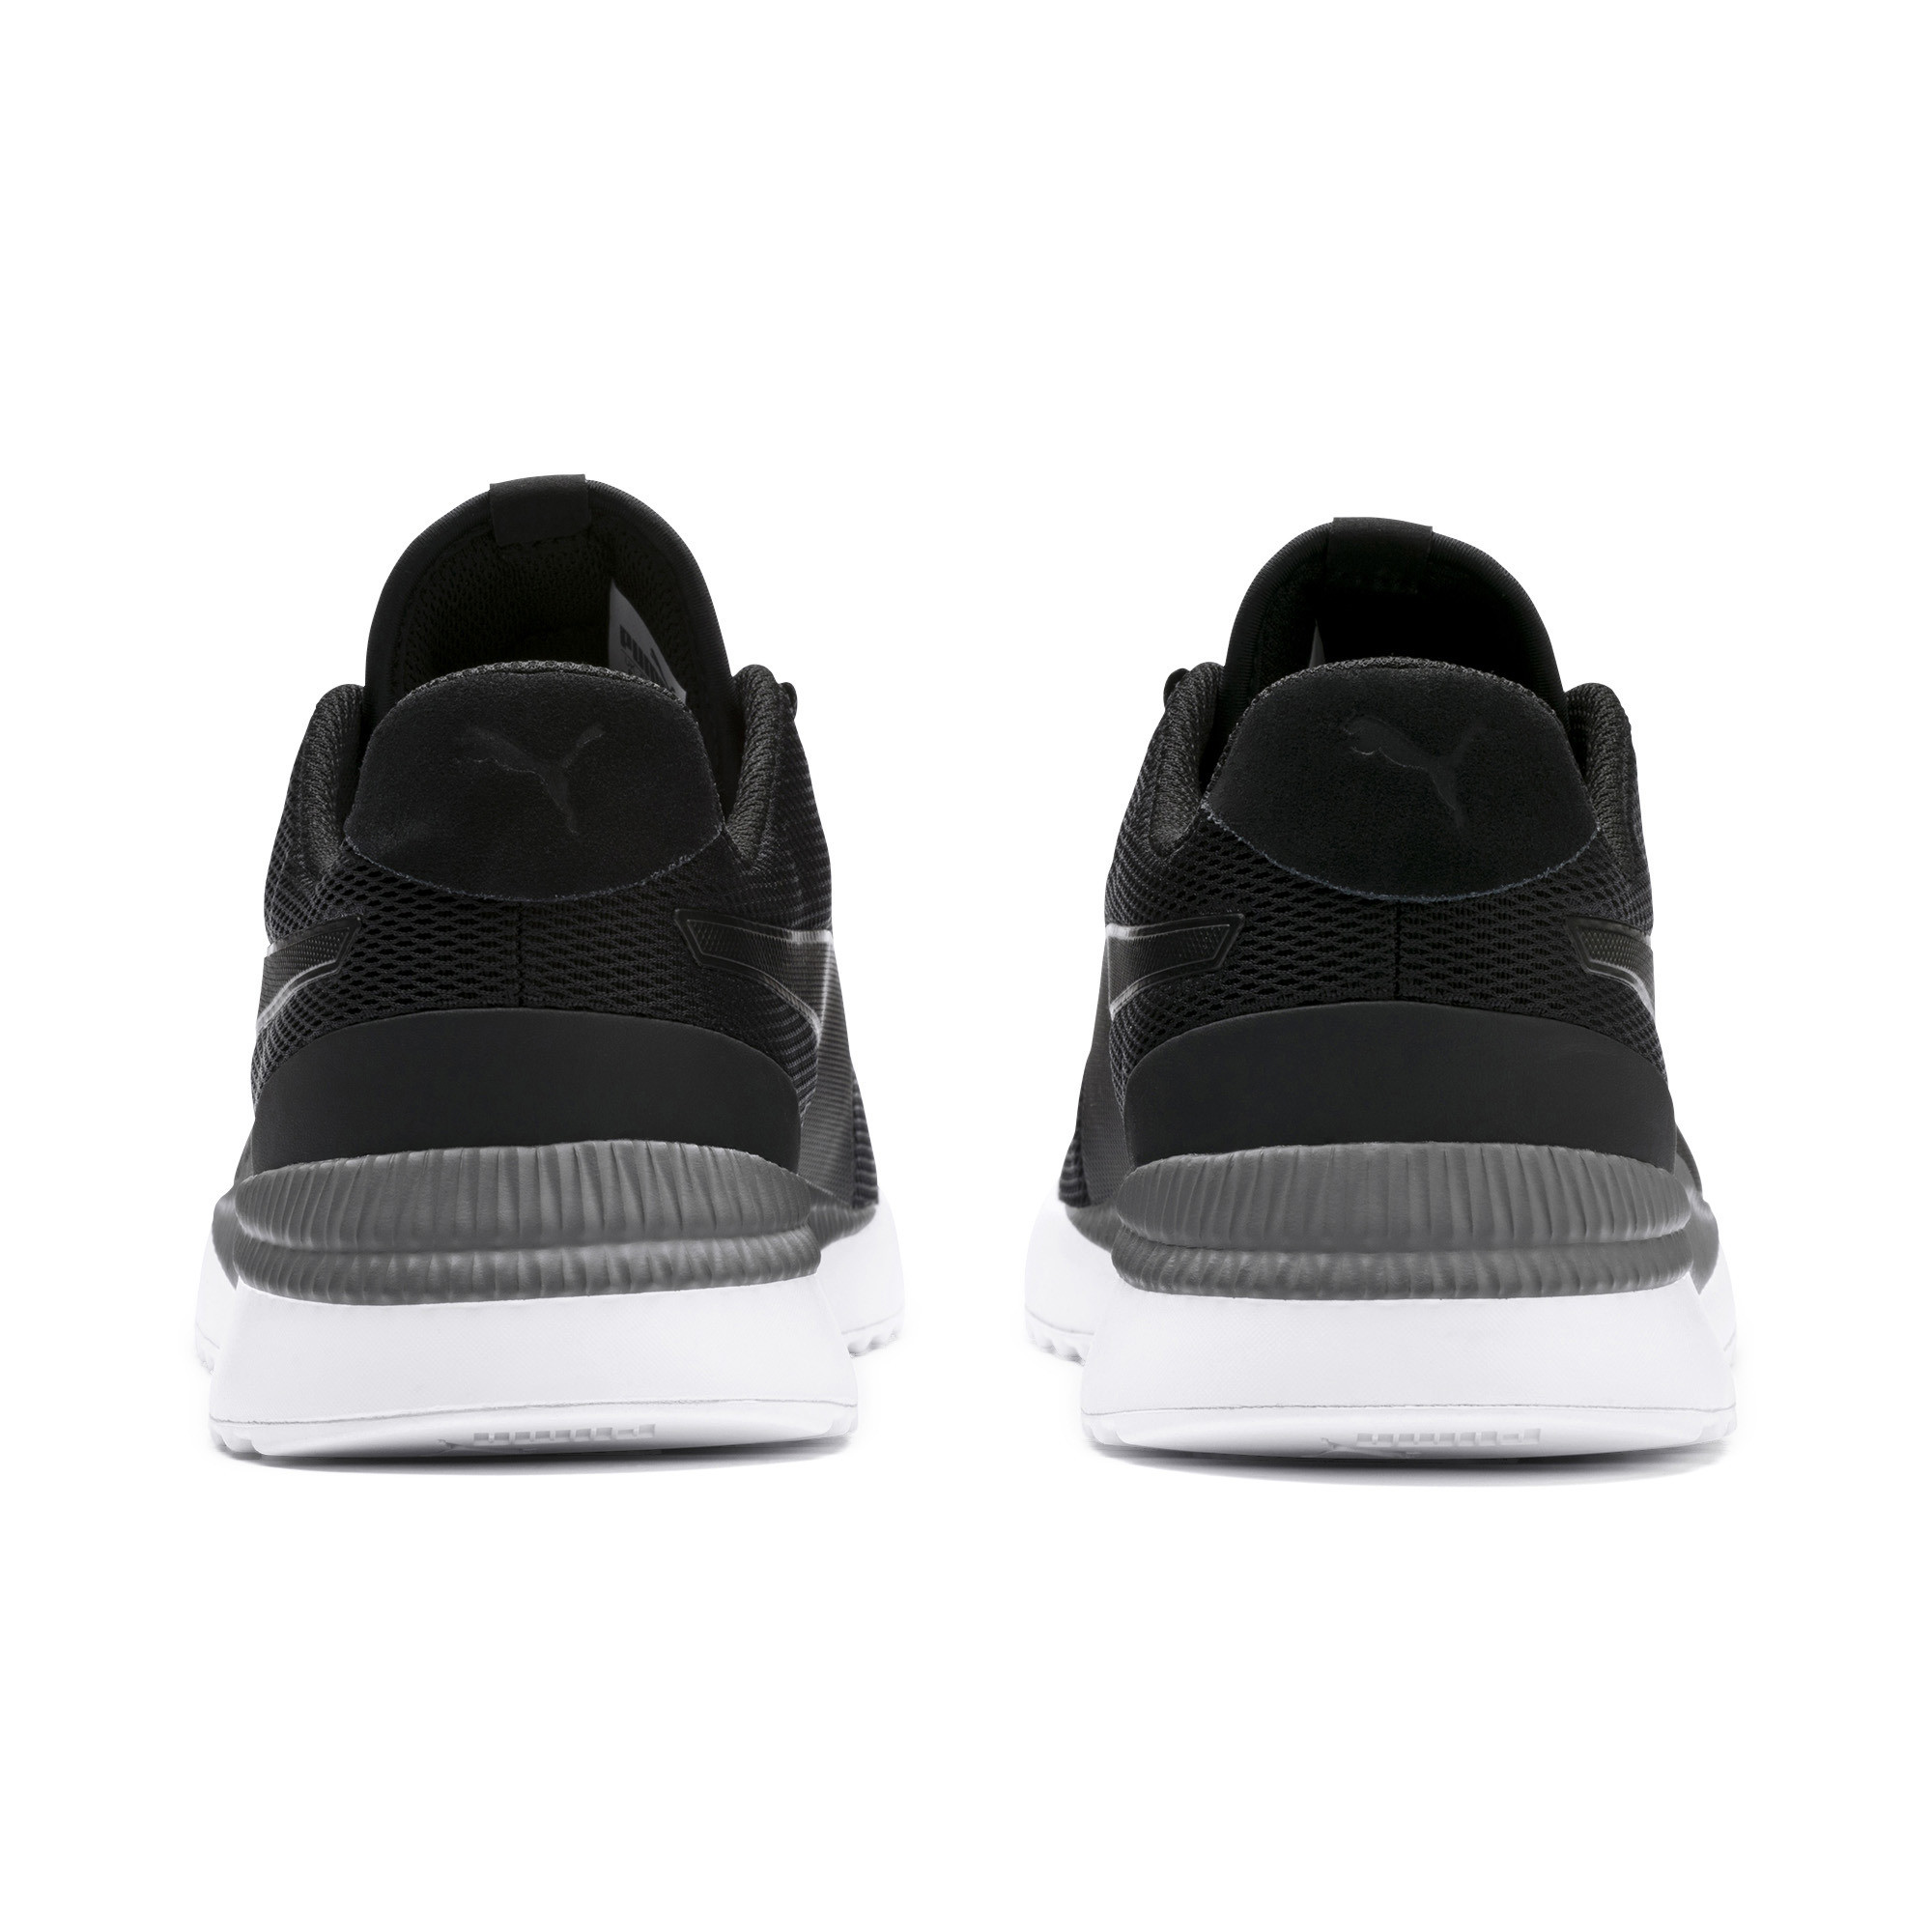 PUMA-Pacer-Next-FS-Men-039-s-Sneakers-Unisex-Shoe-Basics thumbnail 3